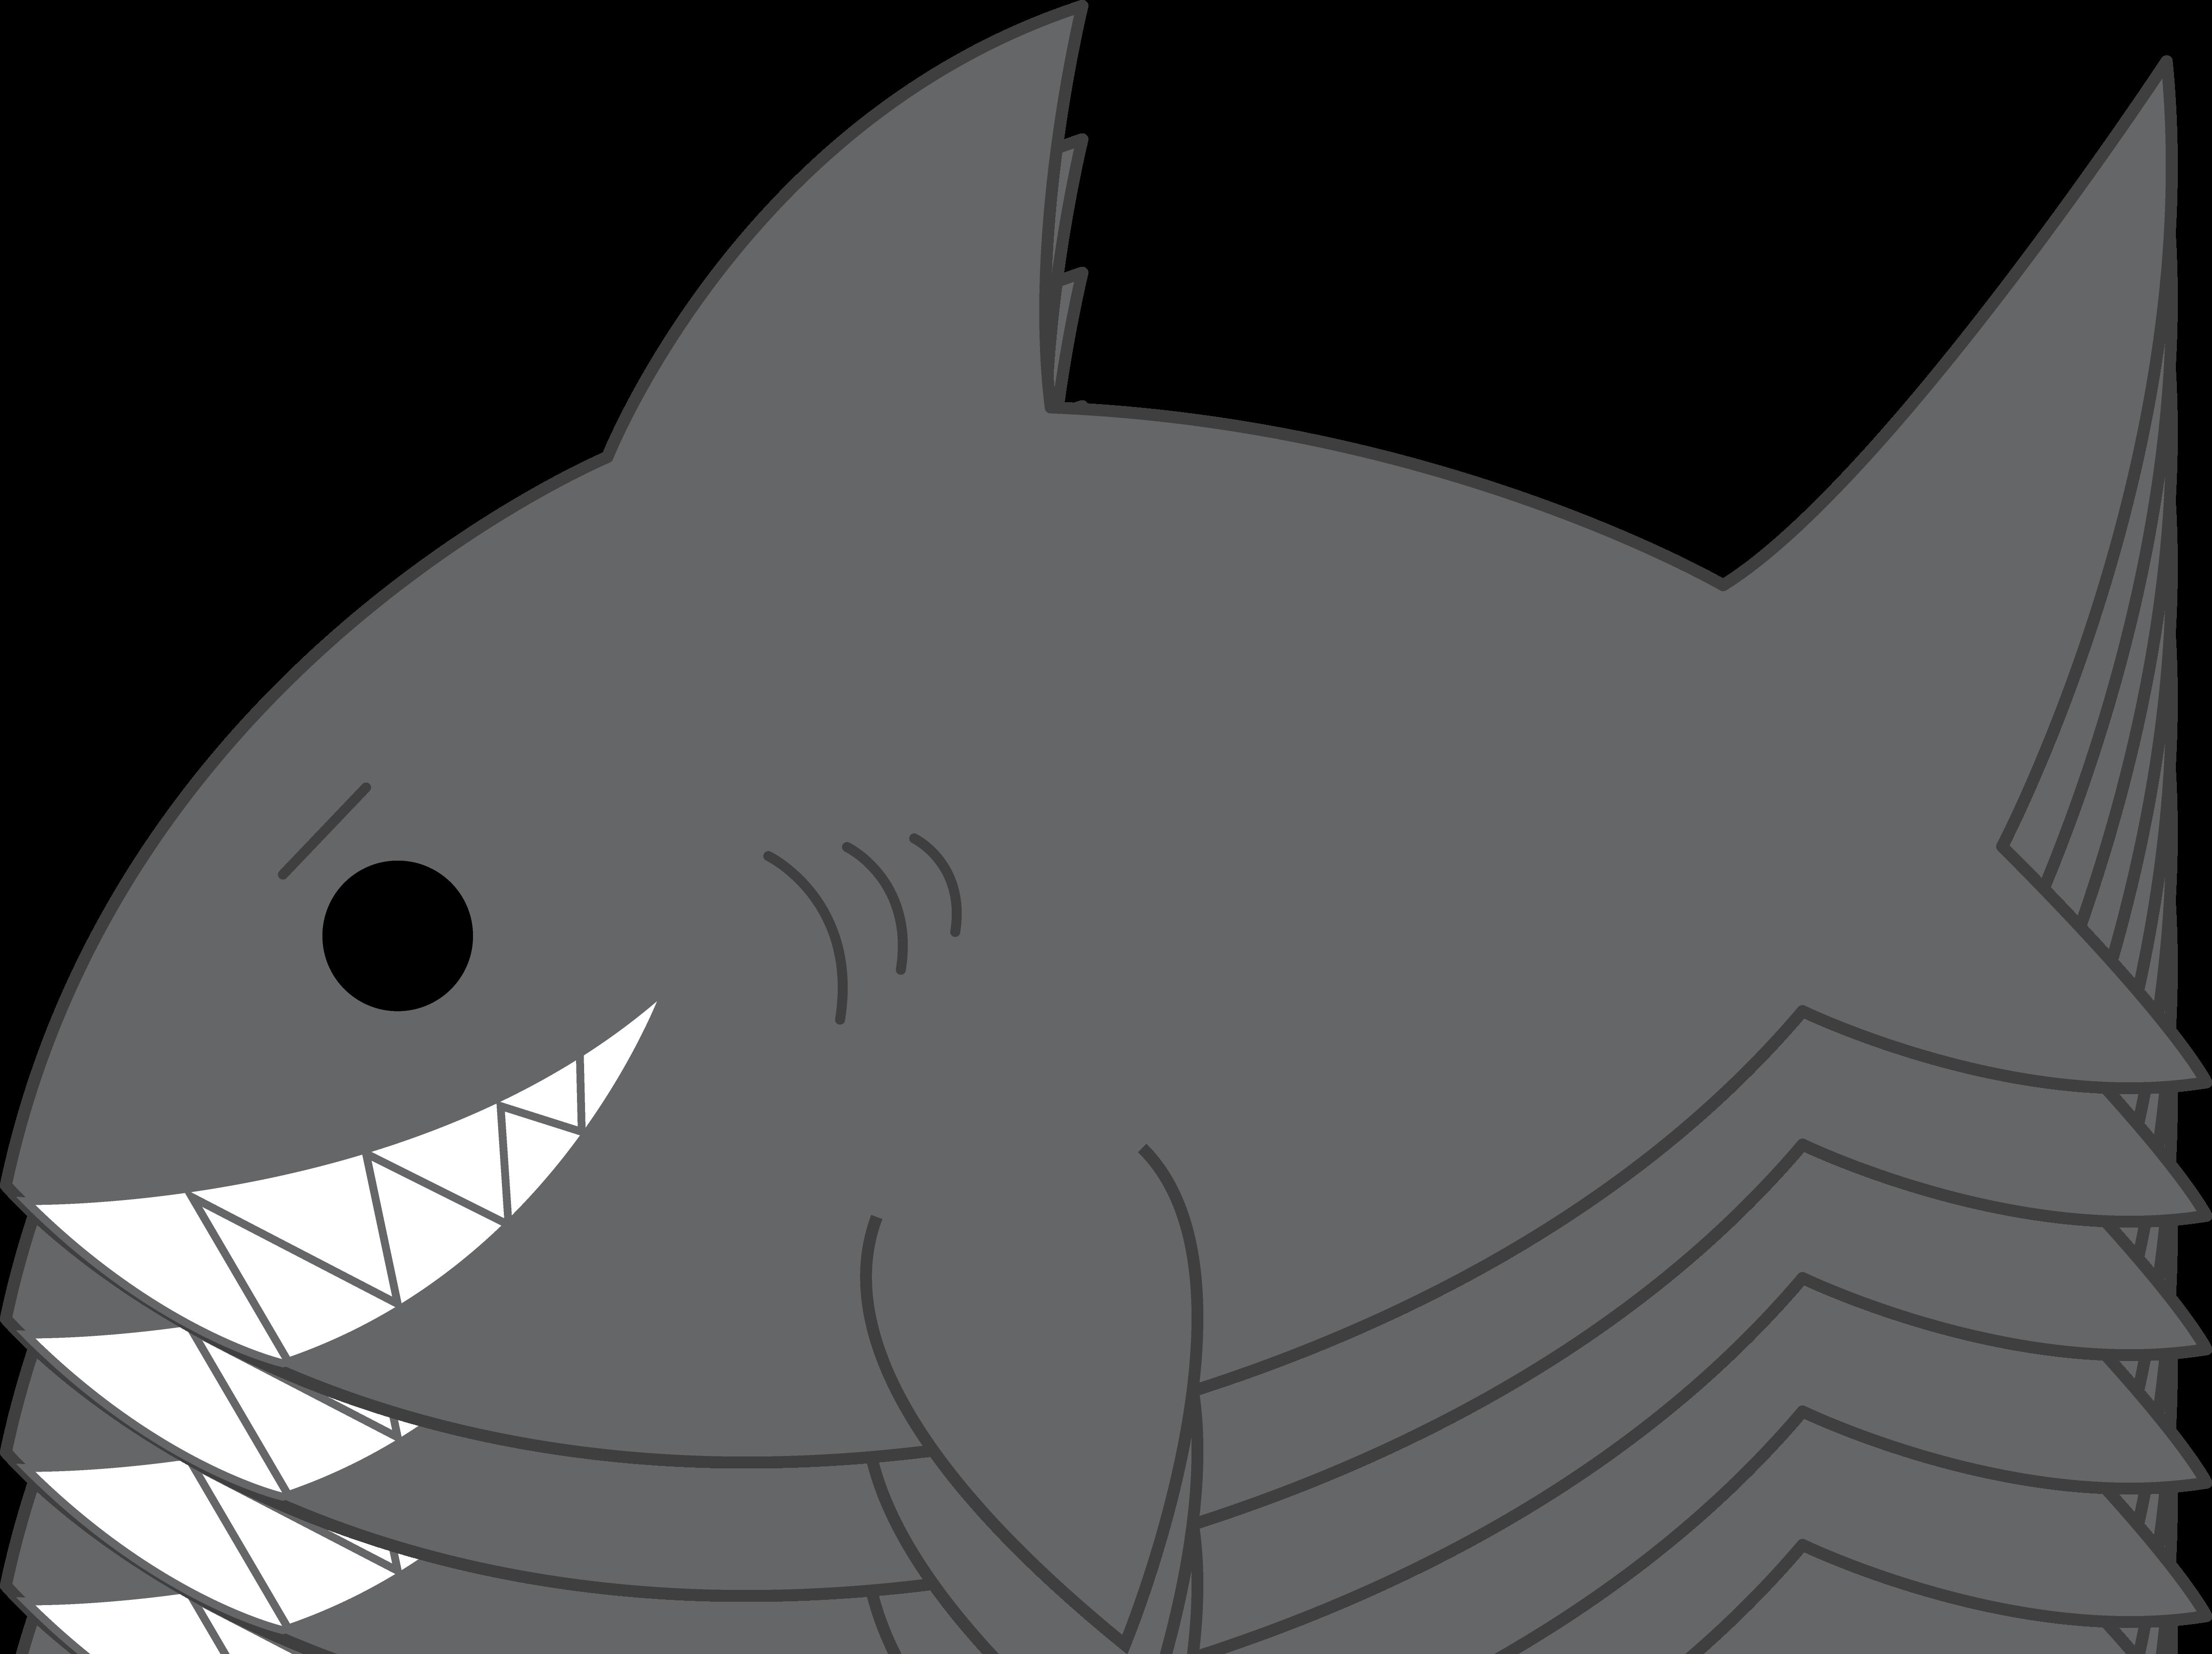 Shark clip art images free clipart 2